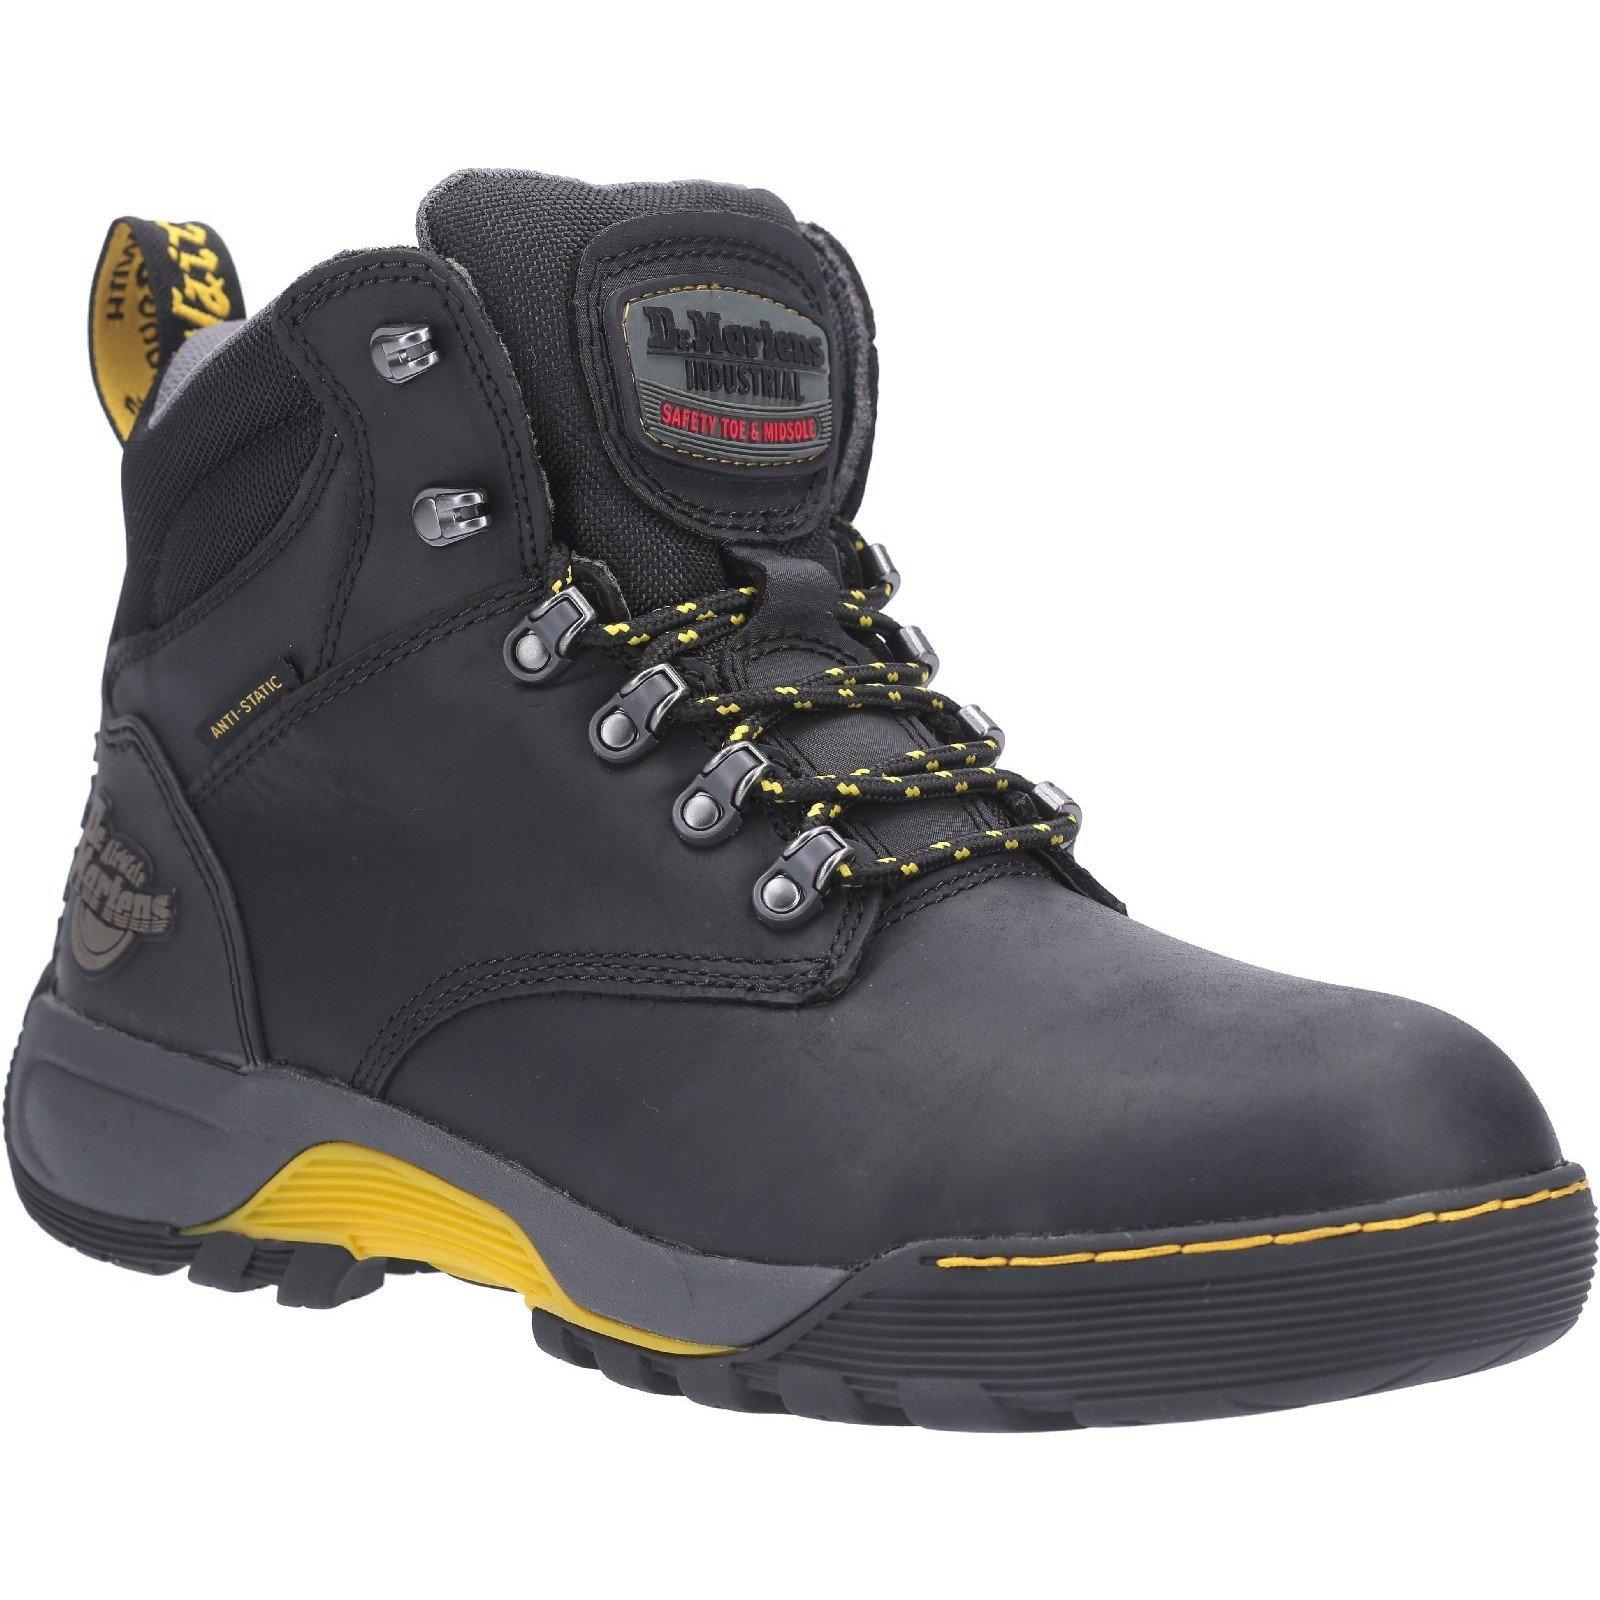 Dr Martens Unisex Ridge ST Lace Up Hiker Safety Boot Black 28324 - Black 9